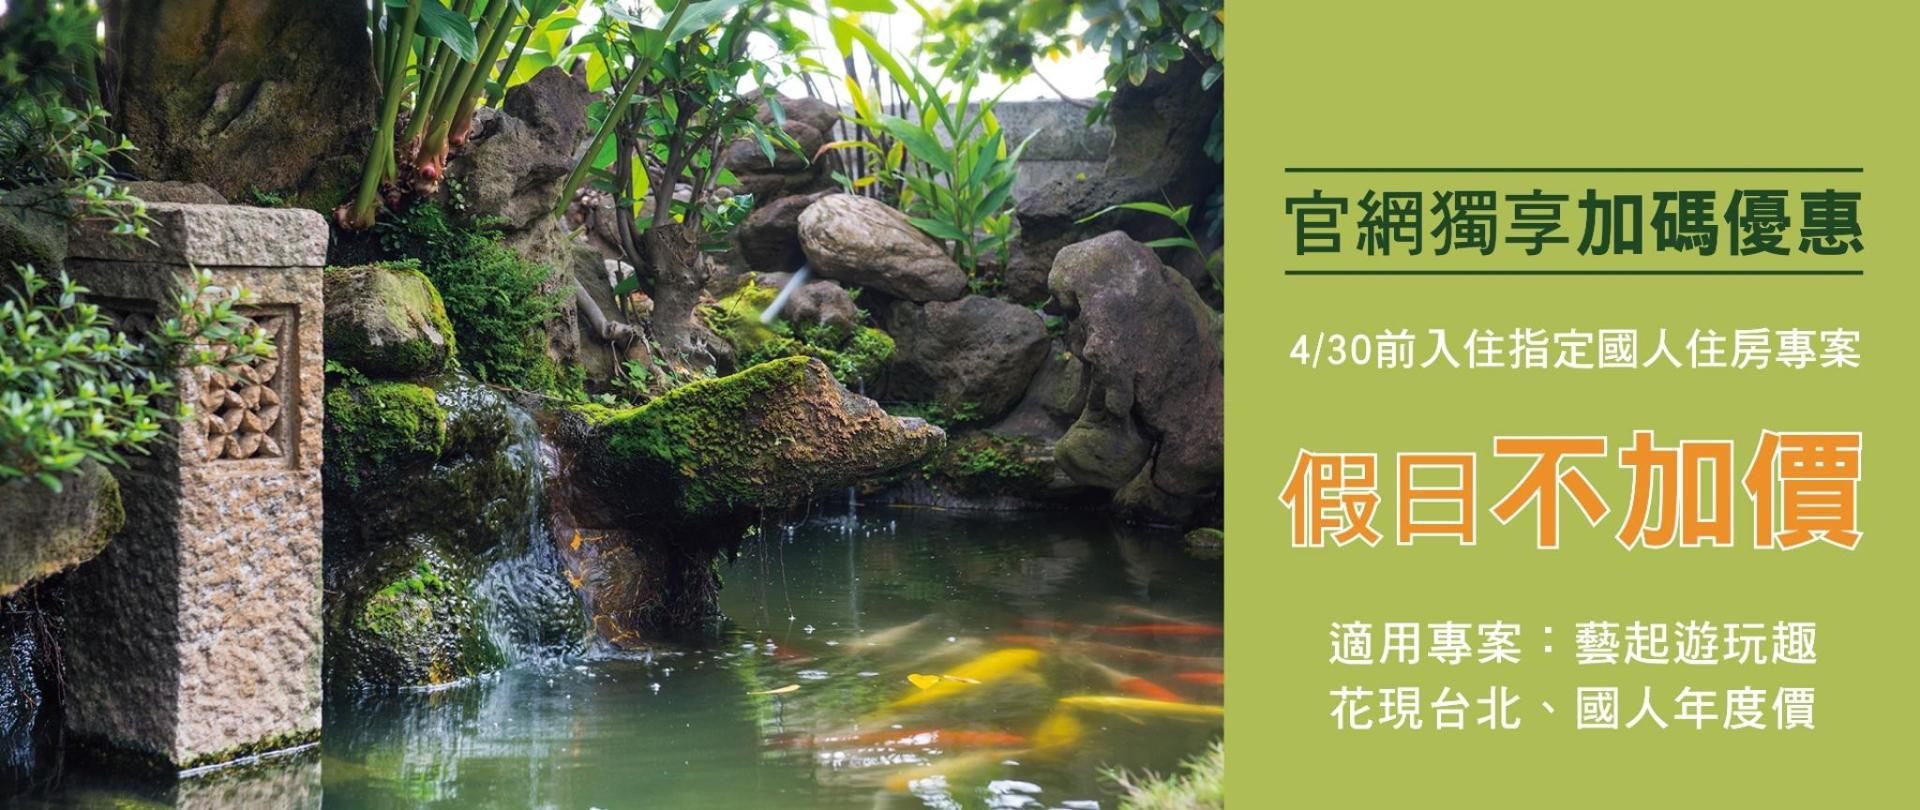 Slide Show1920X810_假日官網獨享加碼.jpg